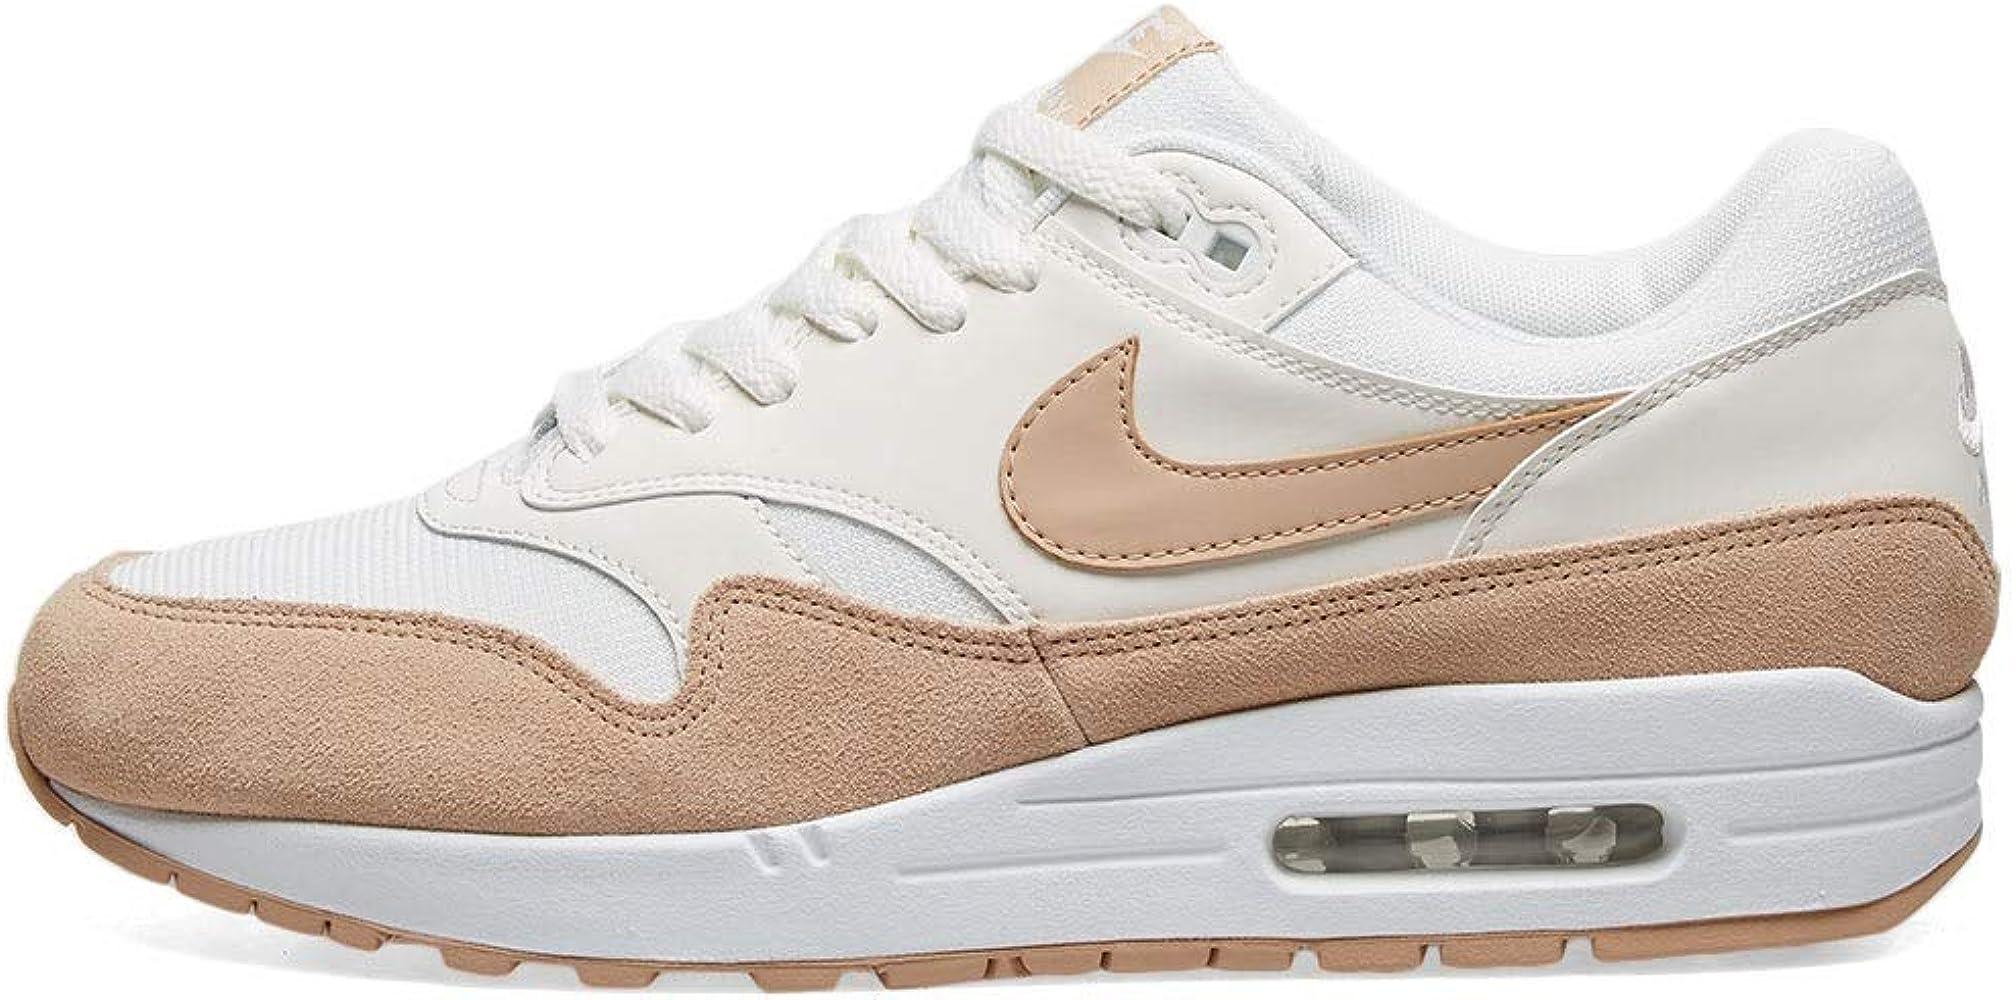 Nike Air Max 1 Premium Sc Zapatillas Running Mujer Blanco